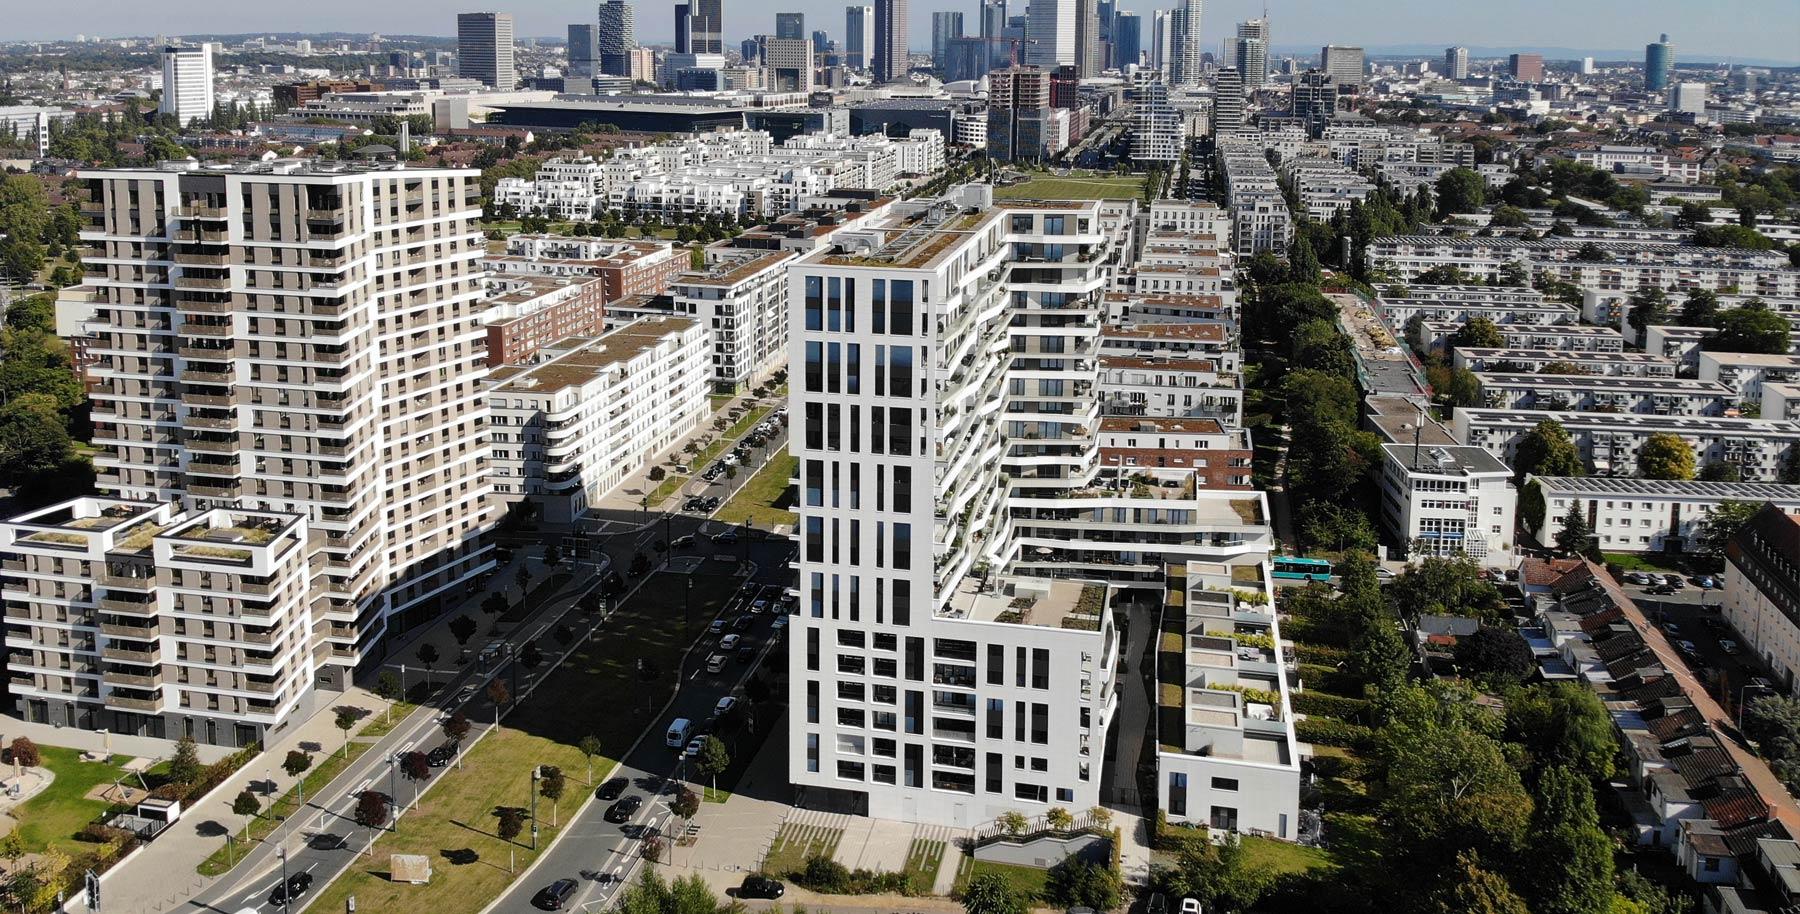 AXIS Frankfurt - AXIS FFM - Luftbild Europaallee - Drohnenfoto Europa-Allee